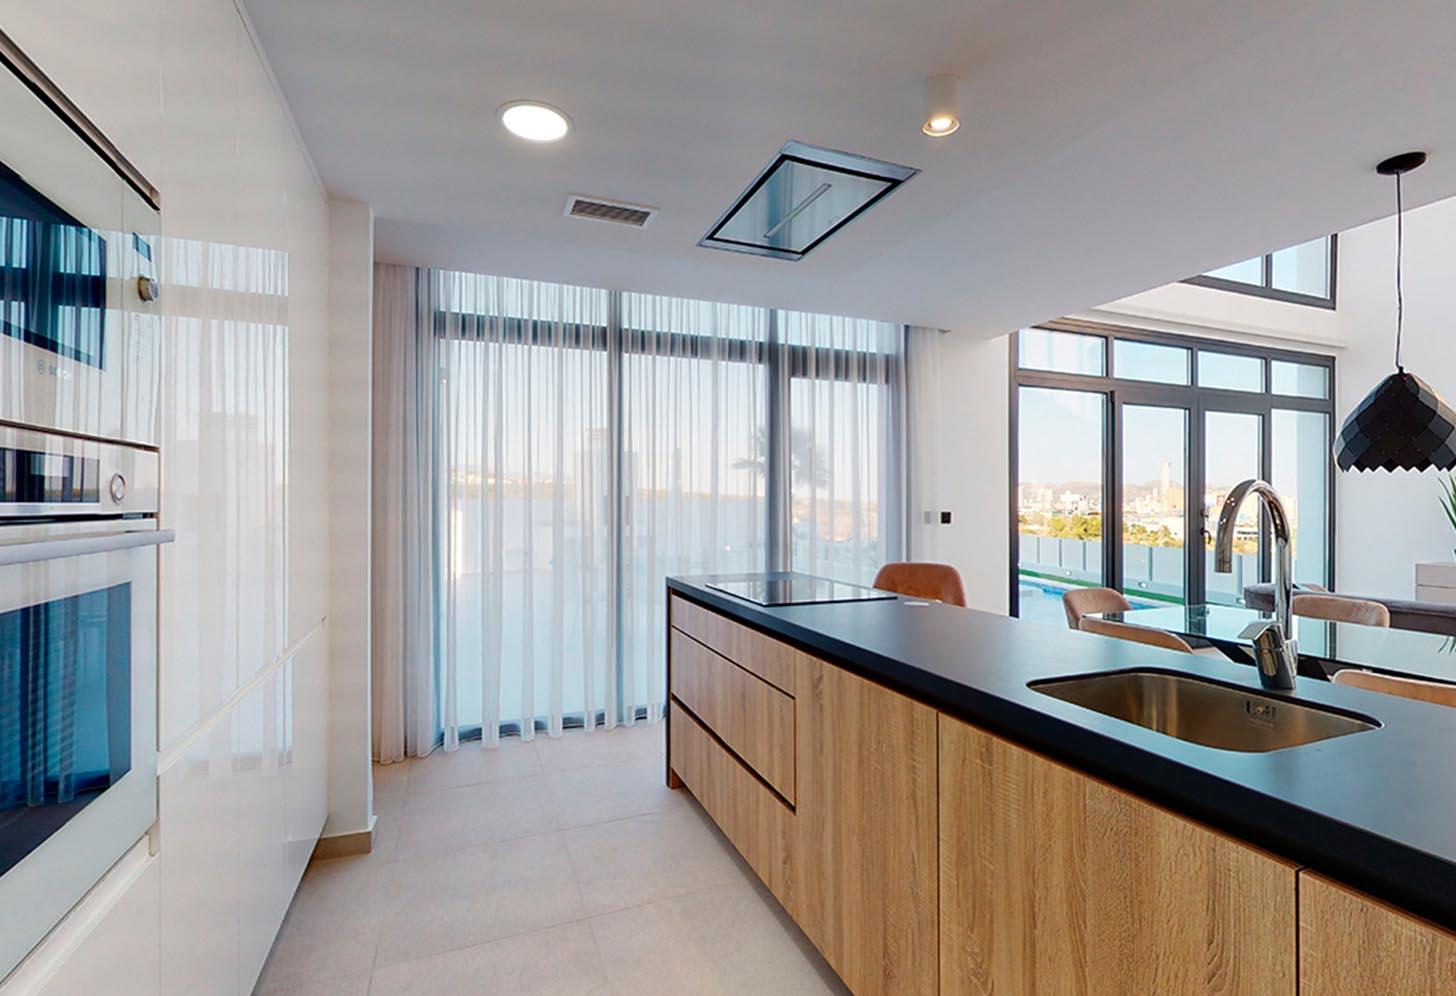 immobilier neuf espagne costa blanca alicante cuisine finestrat